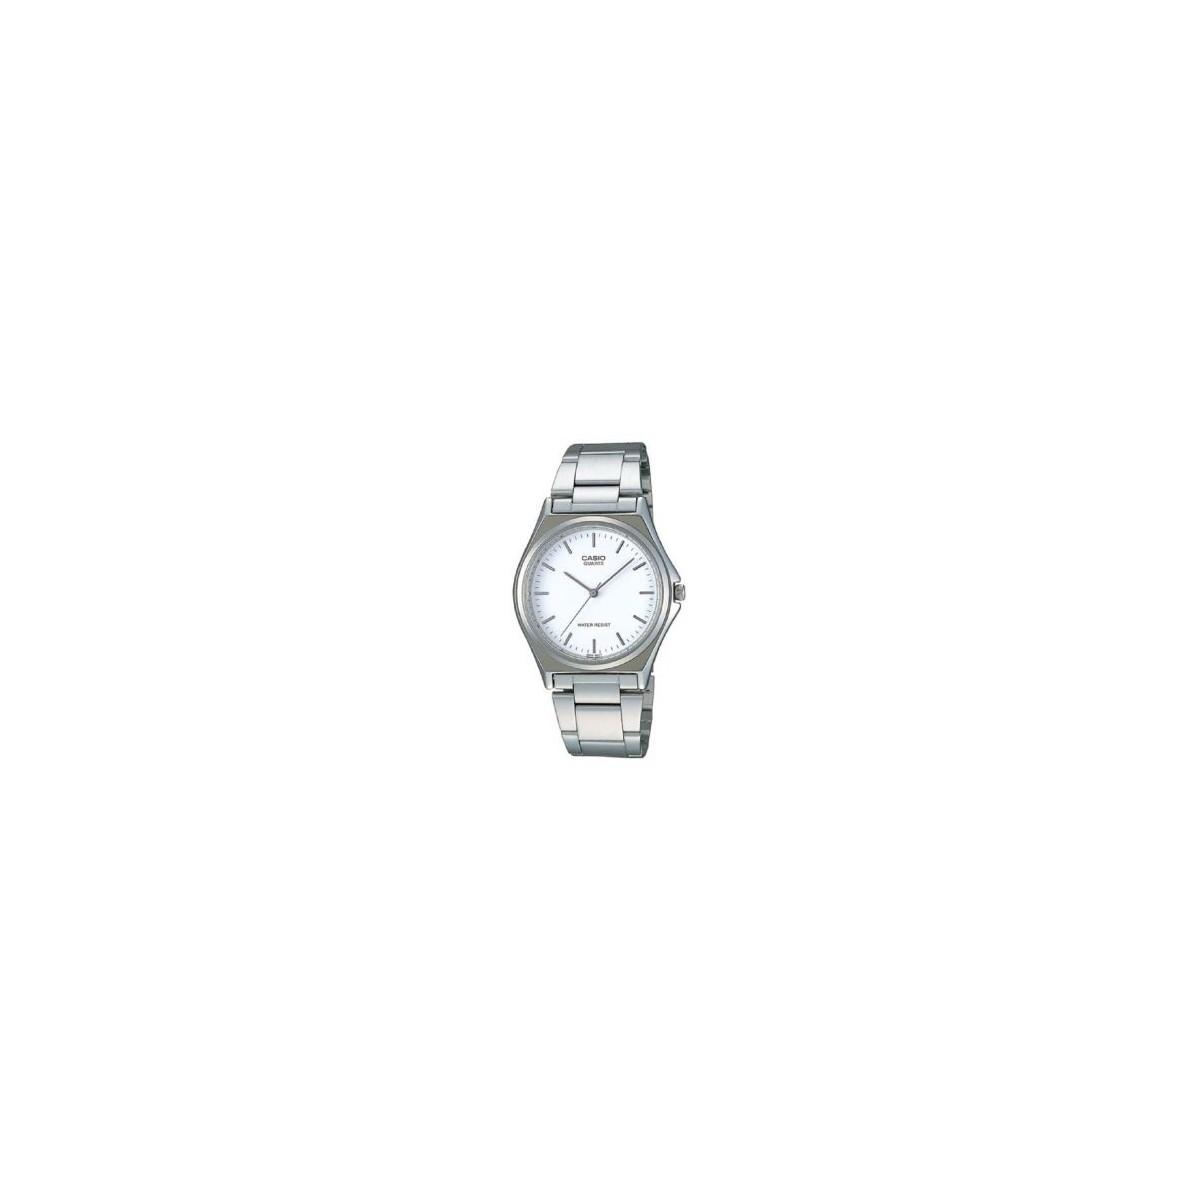 https://www.gaberjoyeria.com/3475-thickbox_default/reloj-casio-hombre.jpg